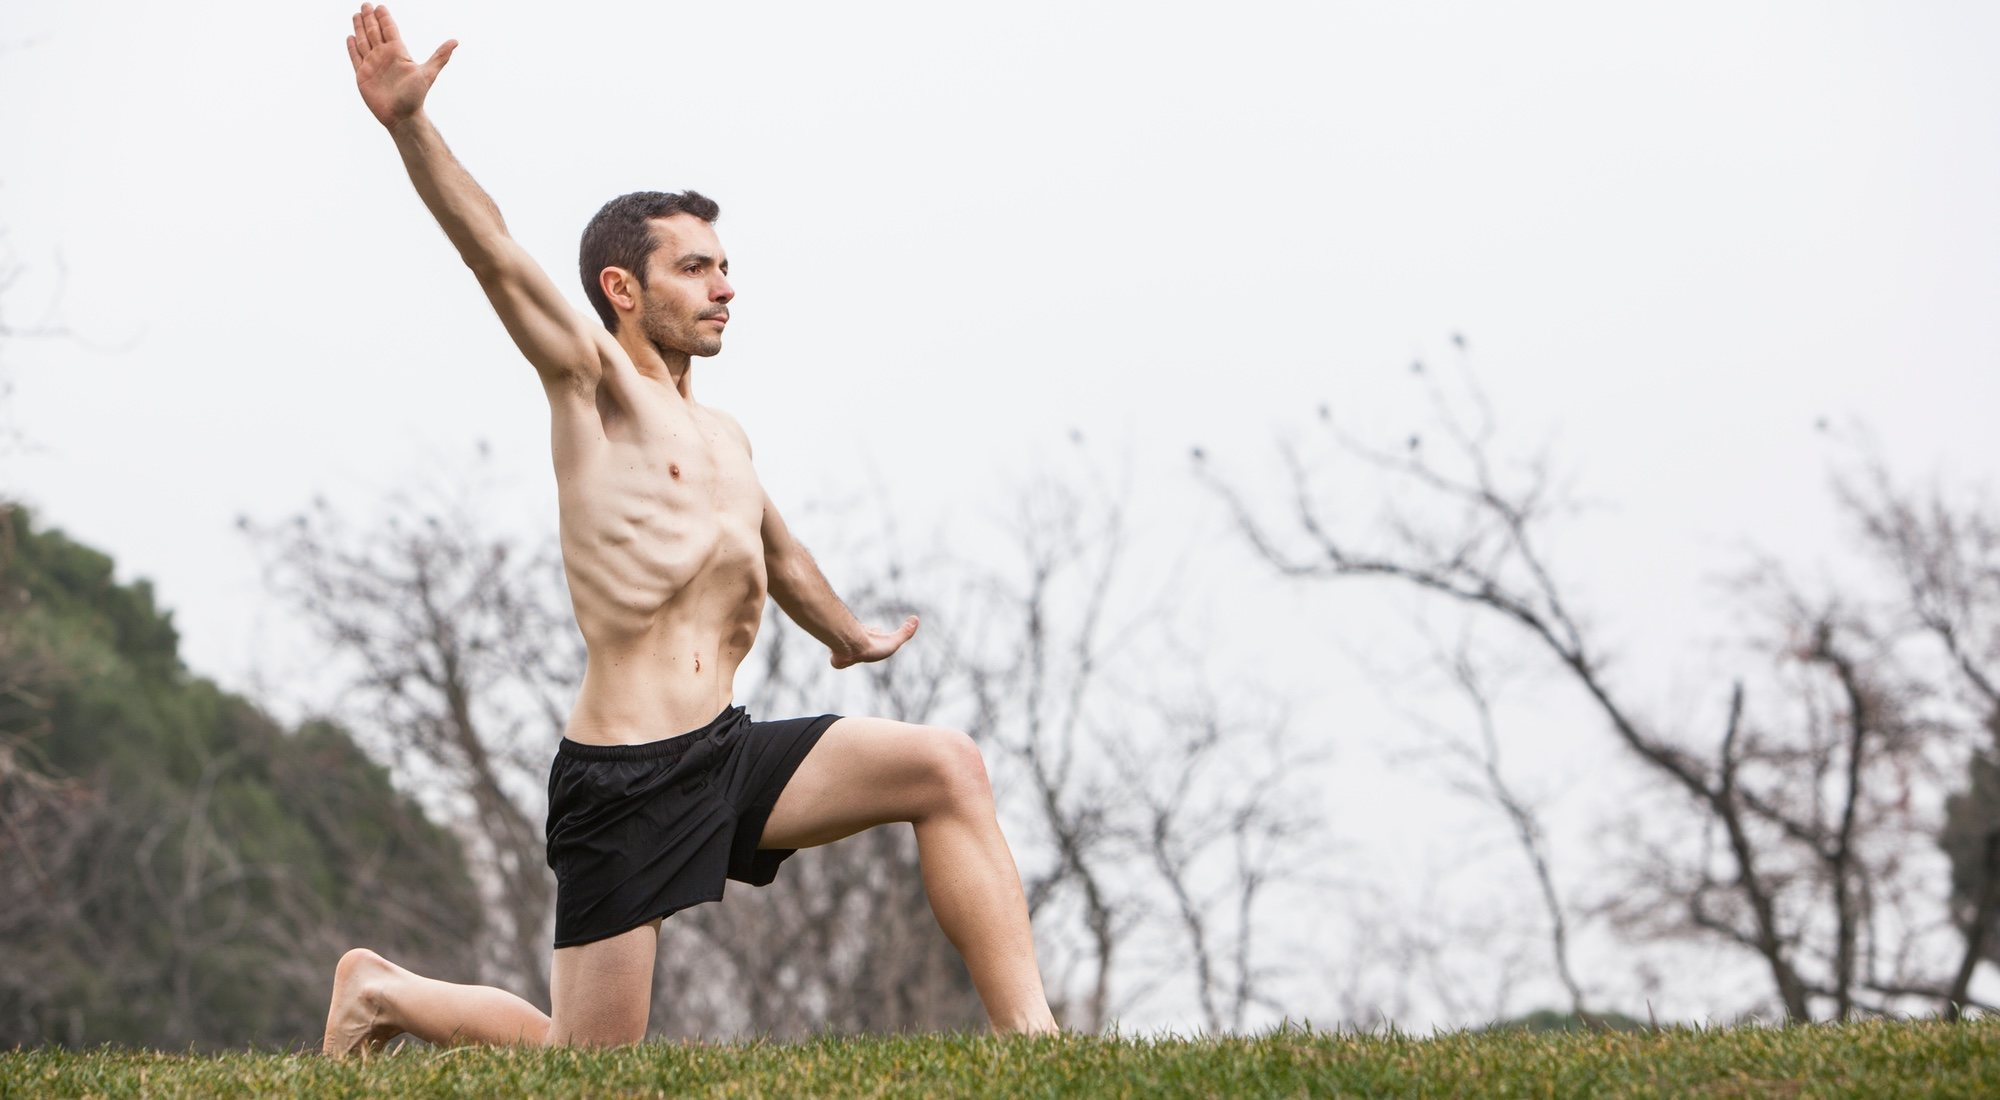 Gimnasia abdominal hipopresiva para hombres